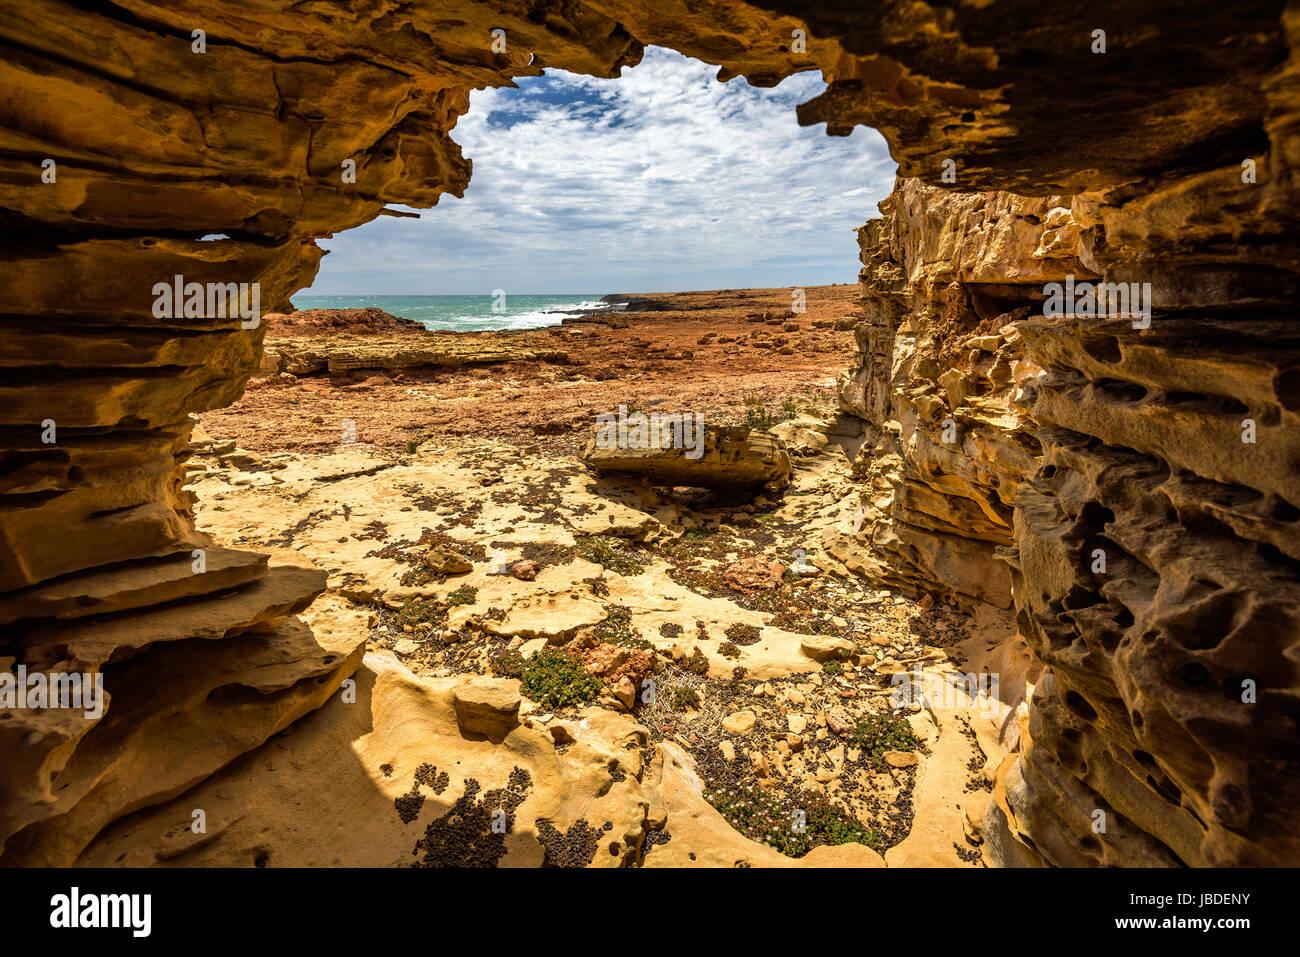 Arch at Quobba Coastline, Western Australia - Stock Image